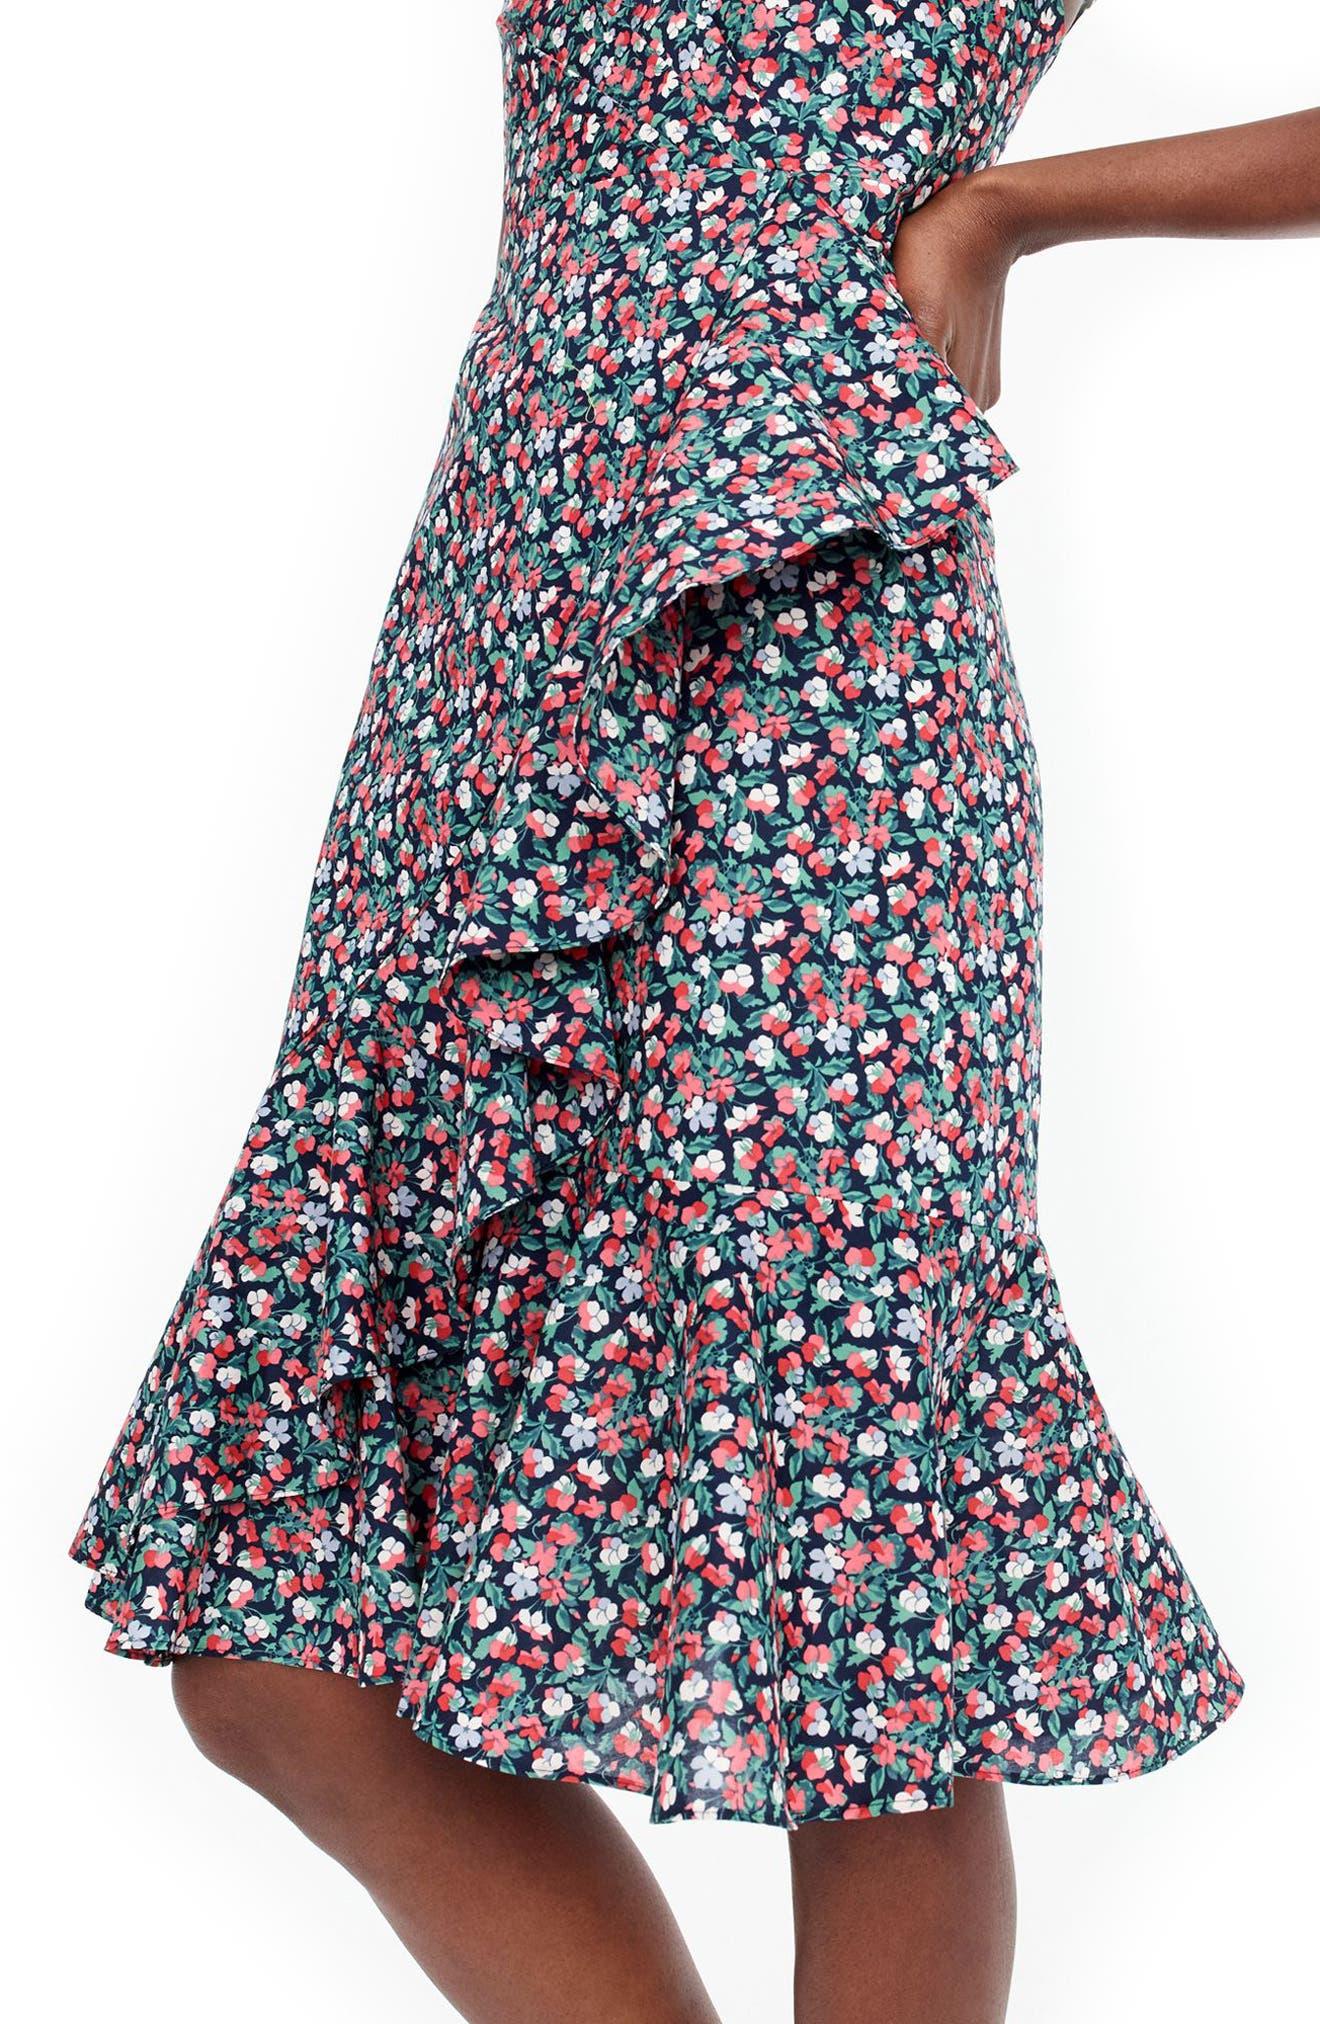 Liberty<sup>®</sup> Sarah Ruffle Dress,                             Alternate thumbnail 3, color,                             Navy Poppy